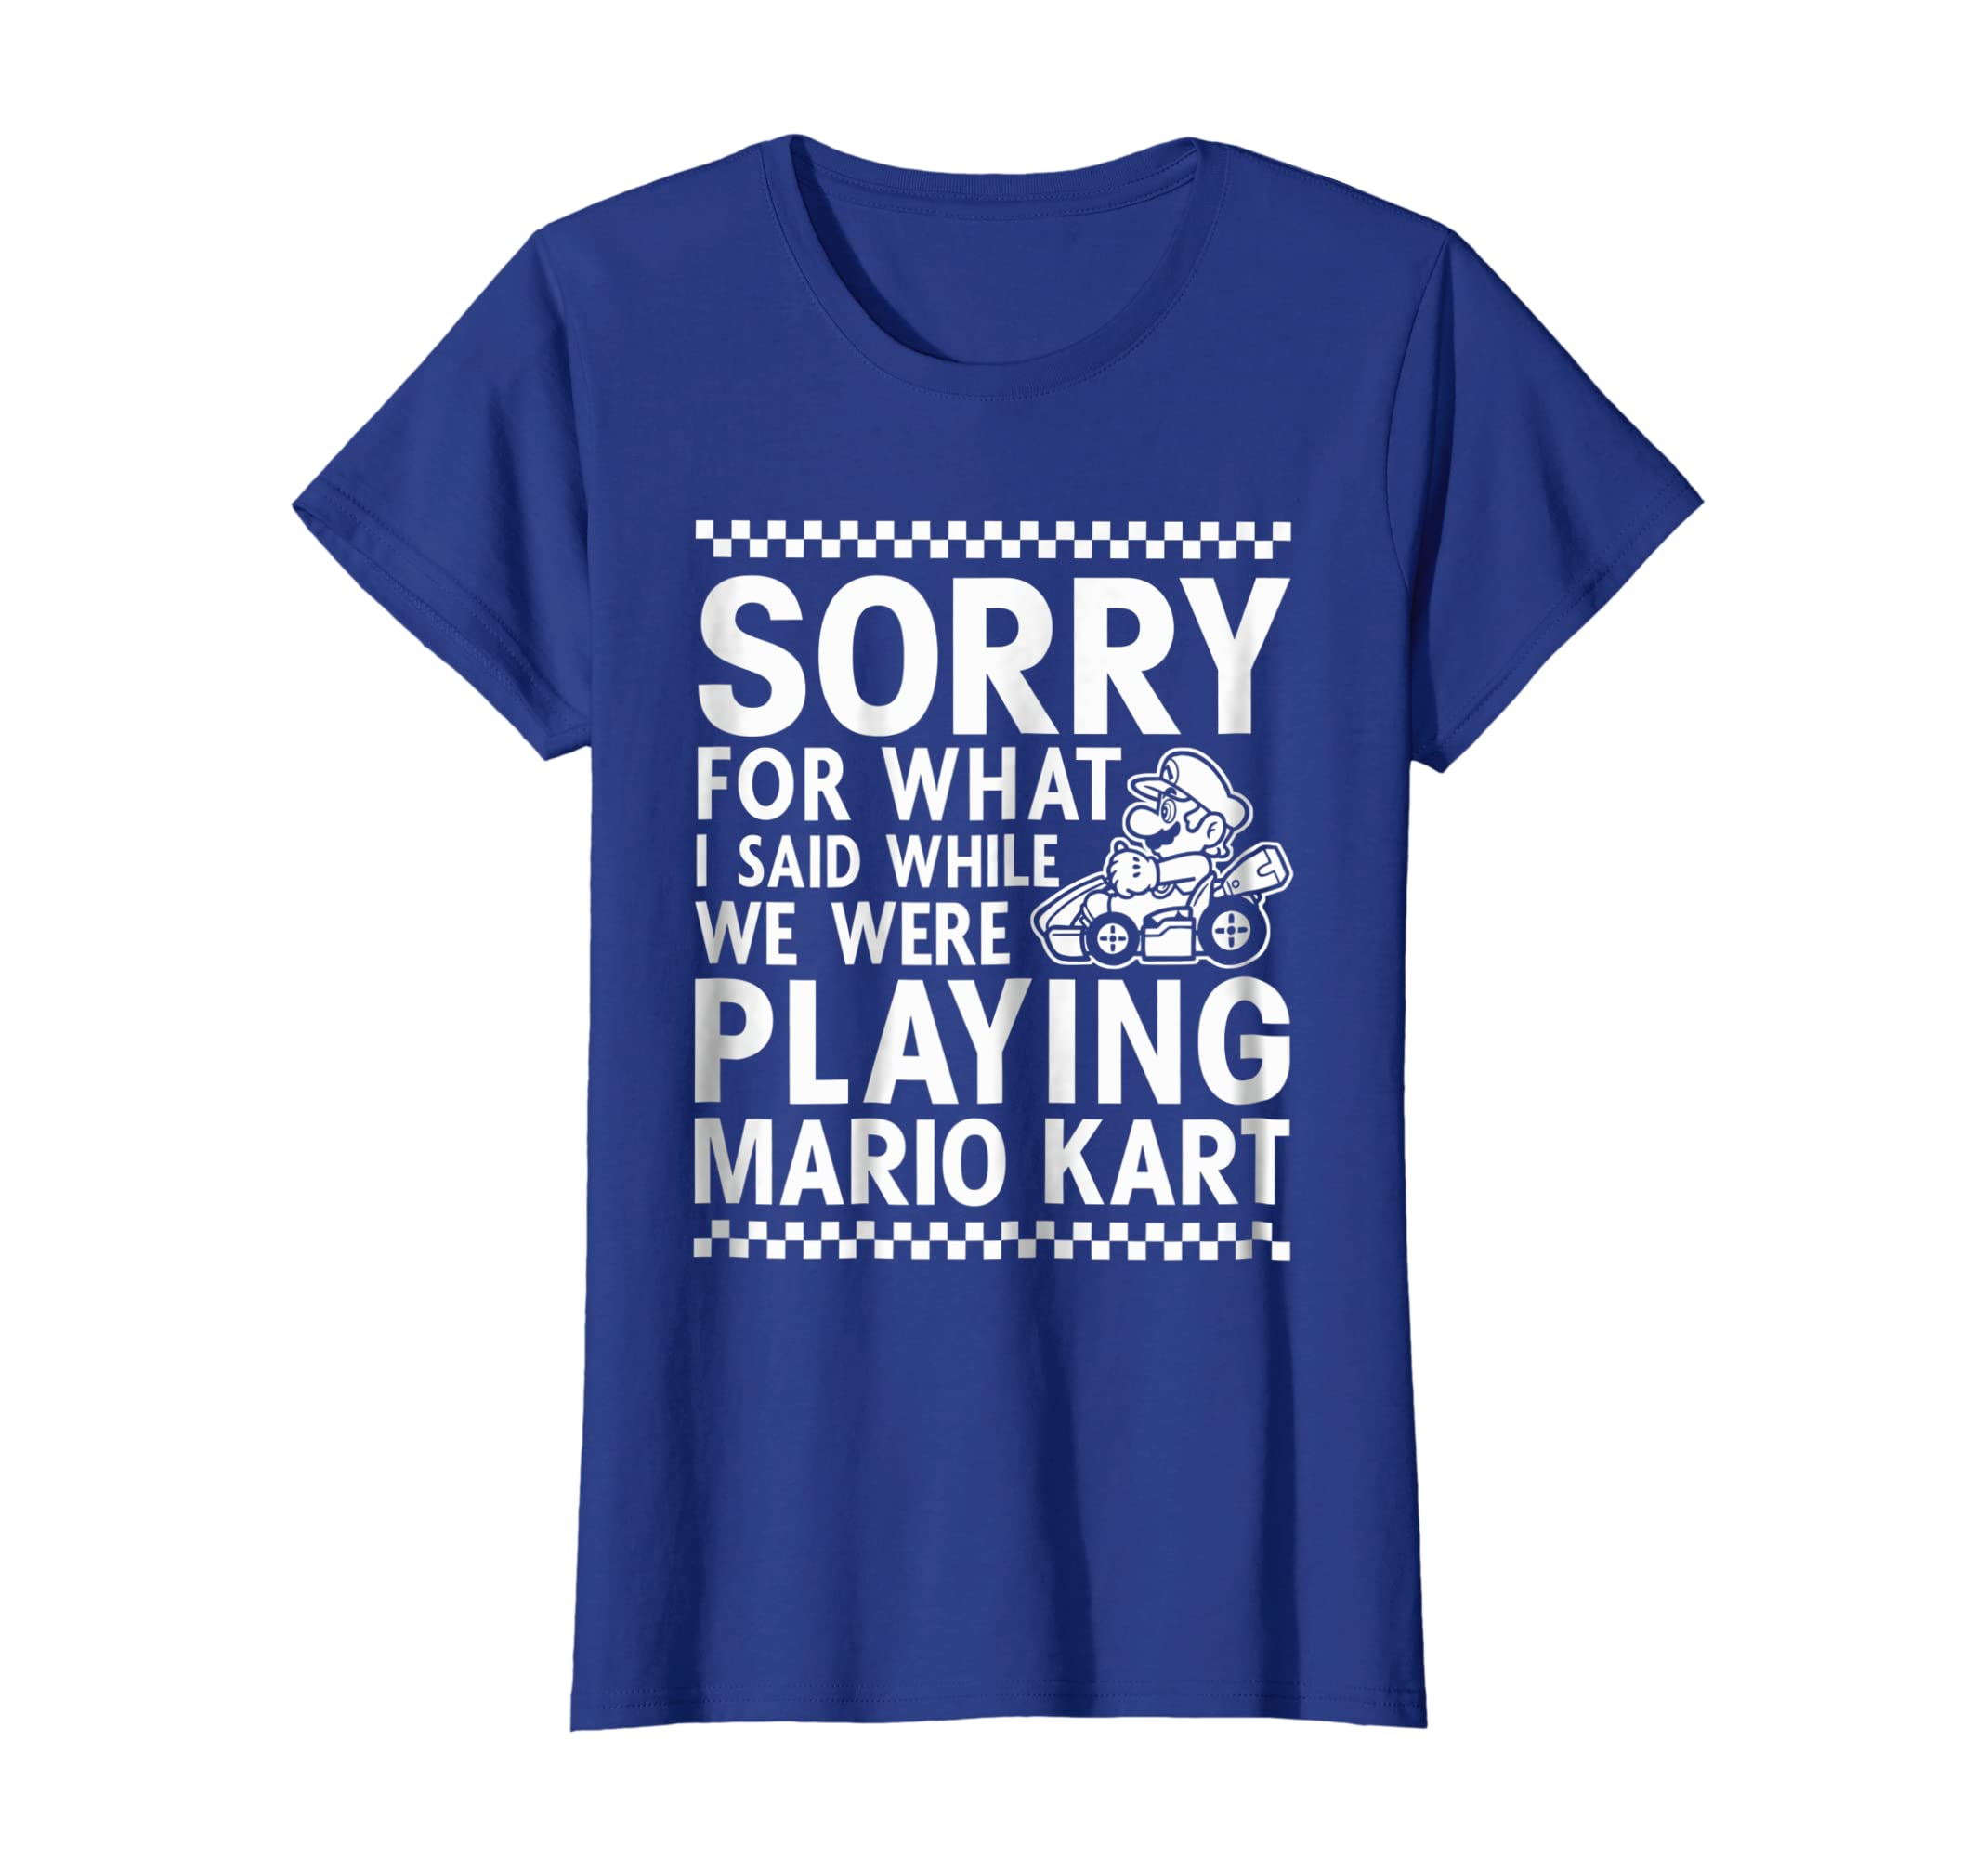 4a1d72aec Amazon.com: Nintendo Mario Kart Checkered Sorry Graphic T-Shirt: Clothing